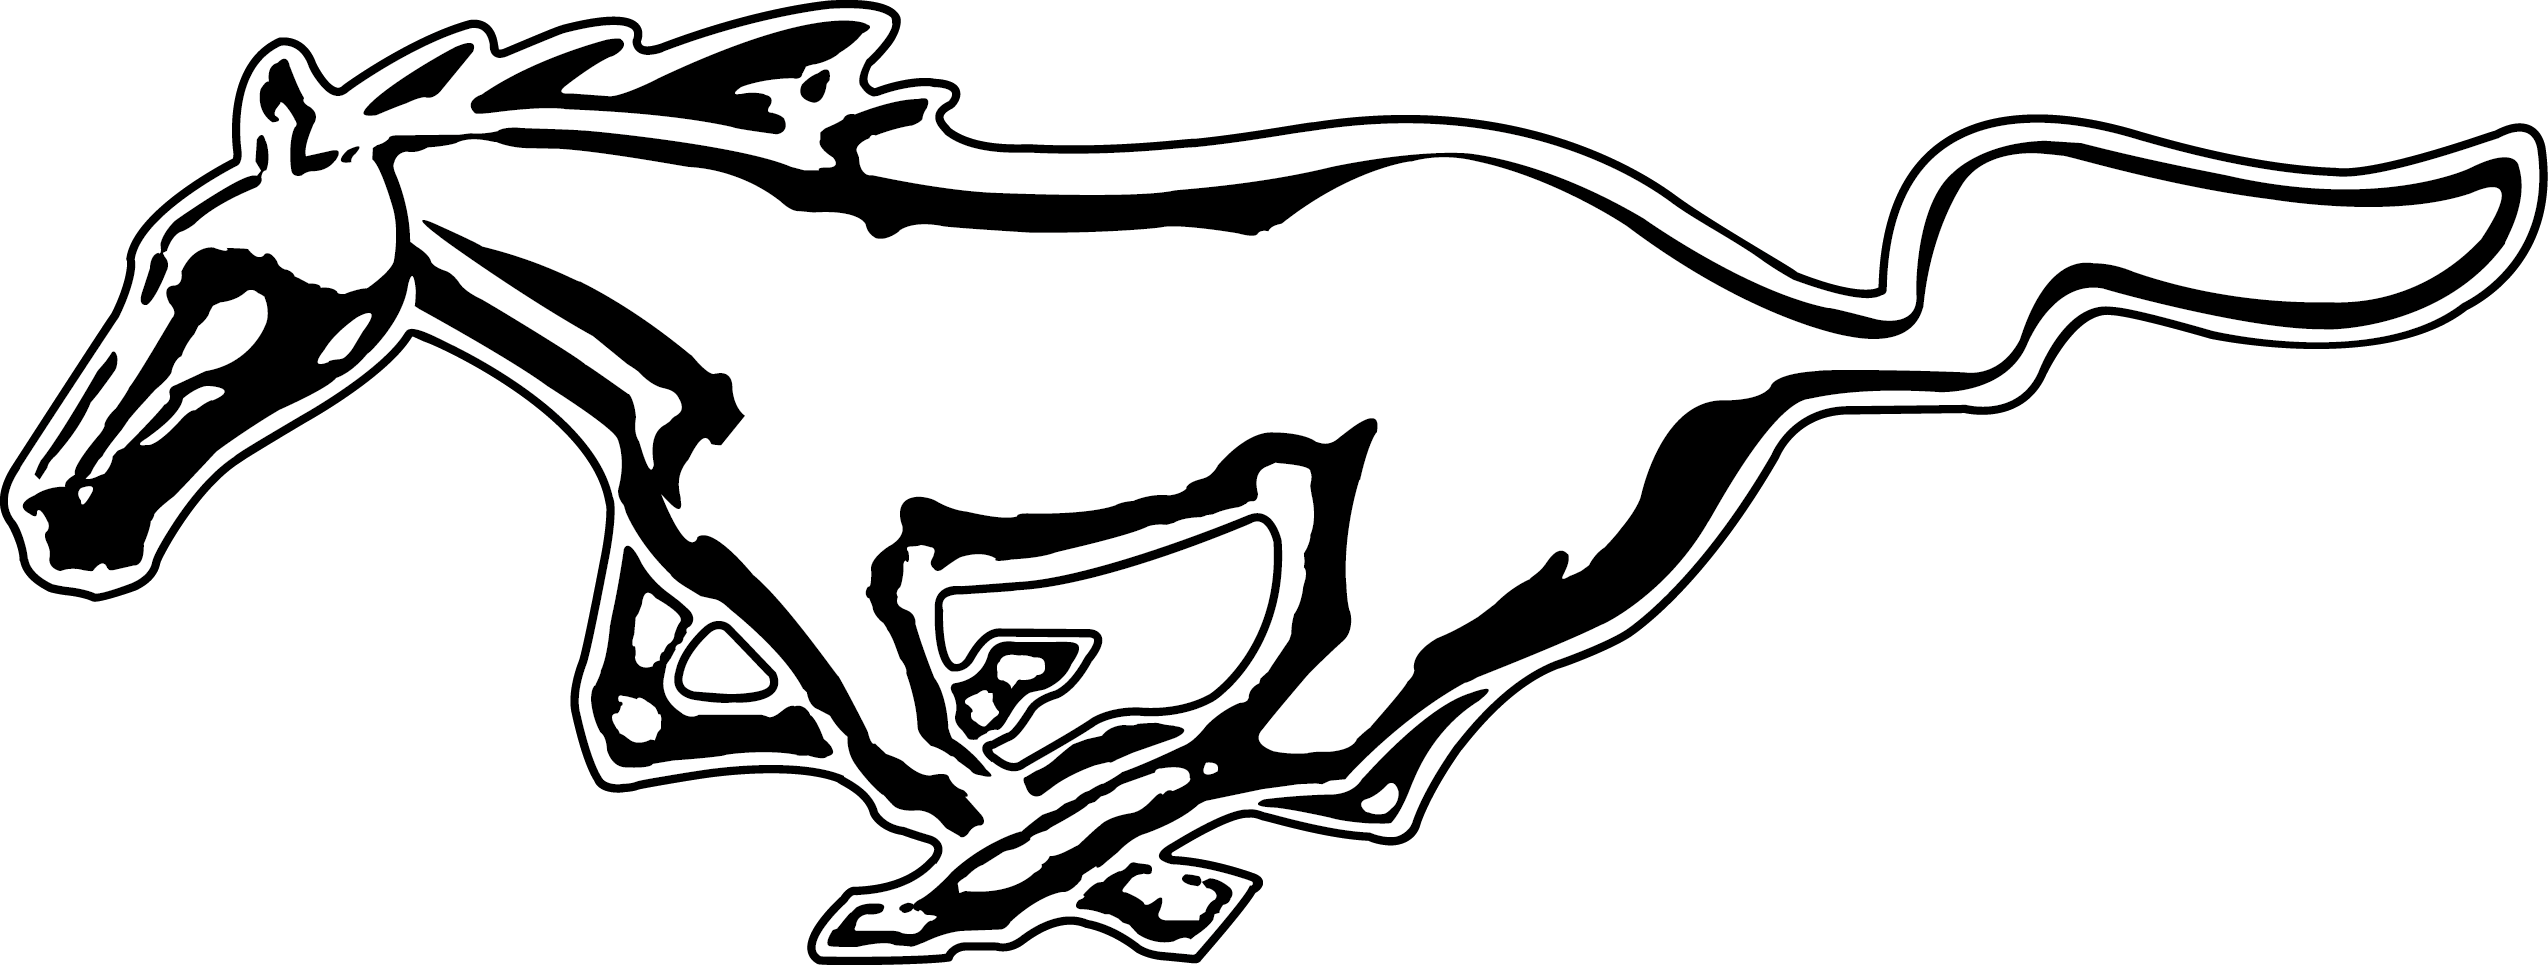 2548x965 15 Ford Mustang Logo Png For Free Download On Mbtskoudsalg